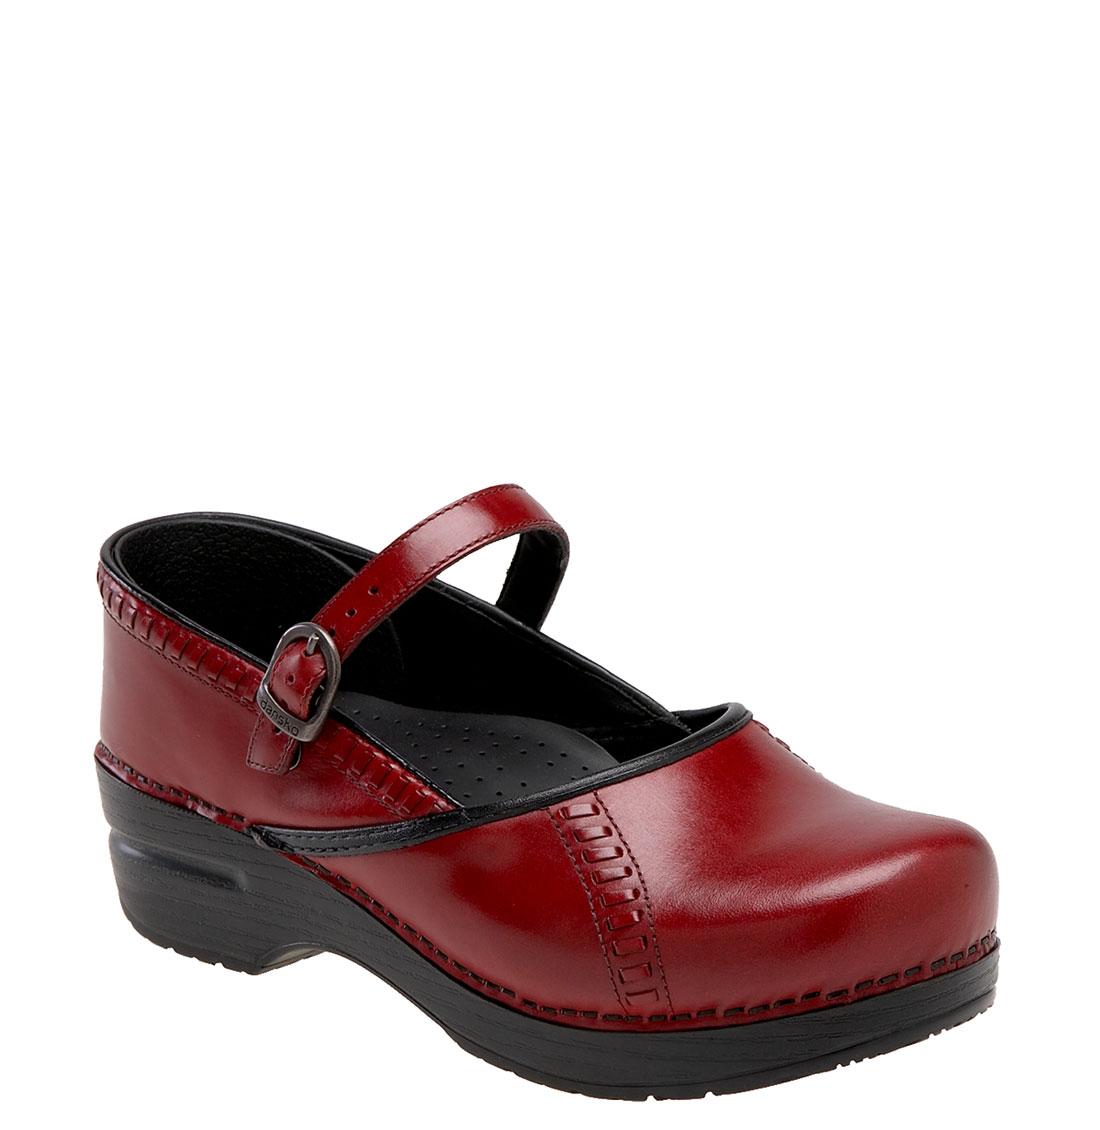 Dansko Patent Leather